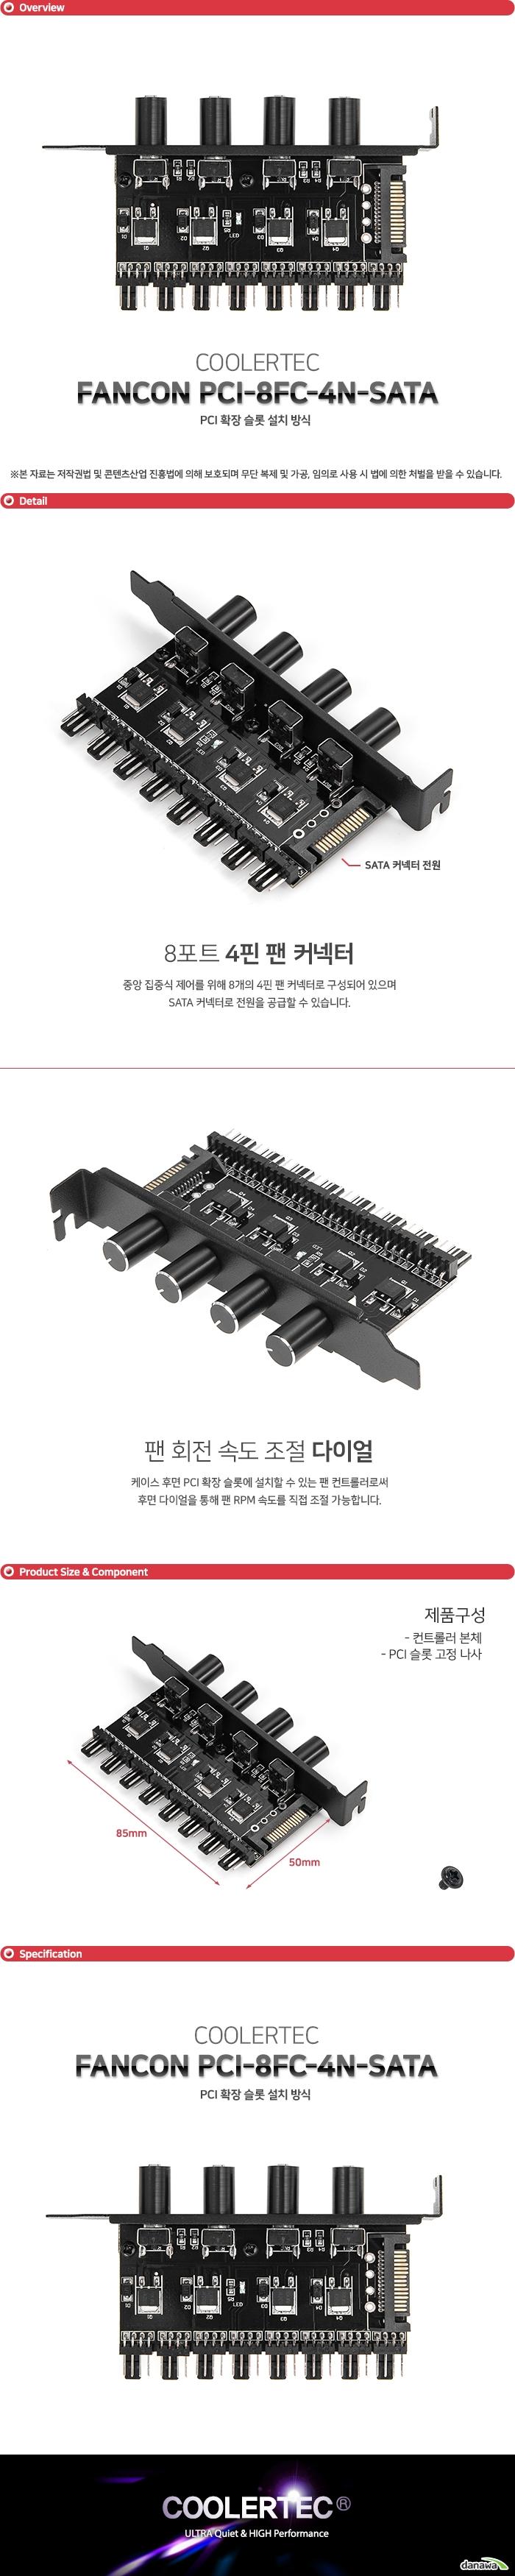 COOLERTEC FANCON PCI-8FC-4N-SATA